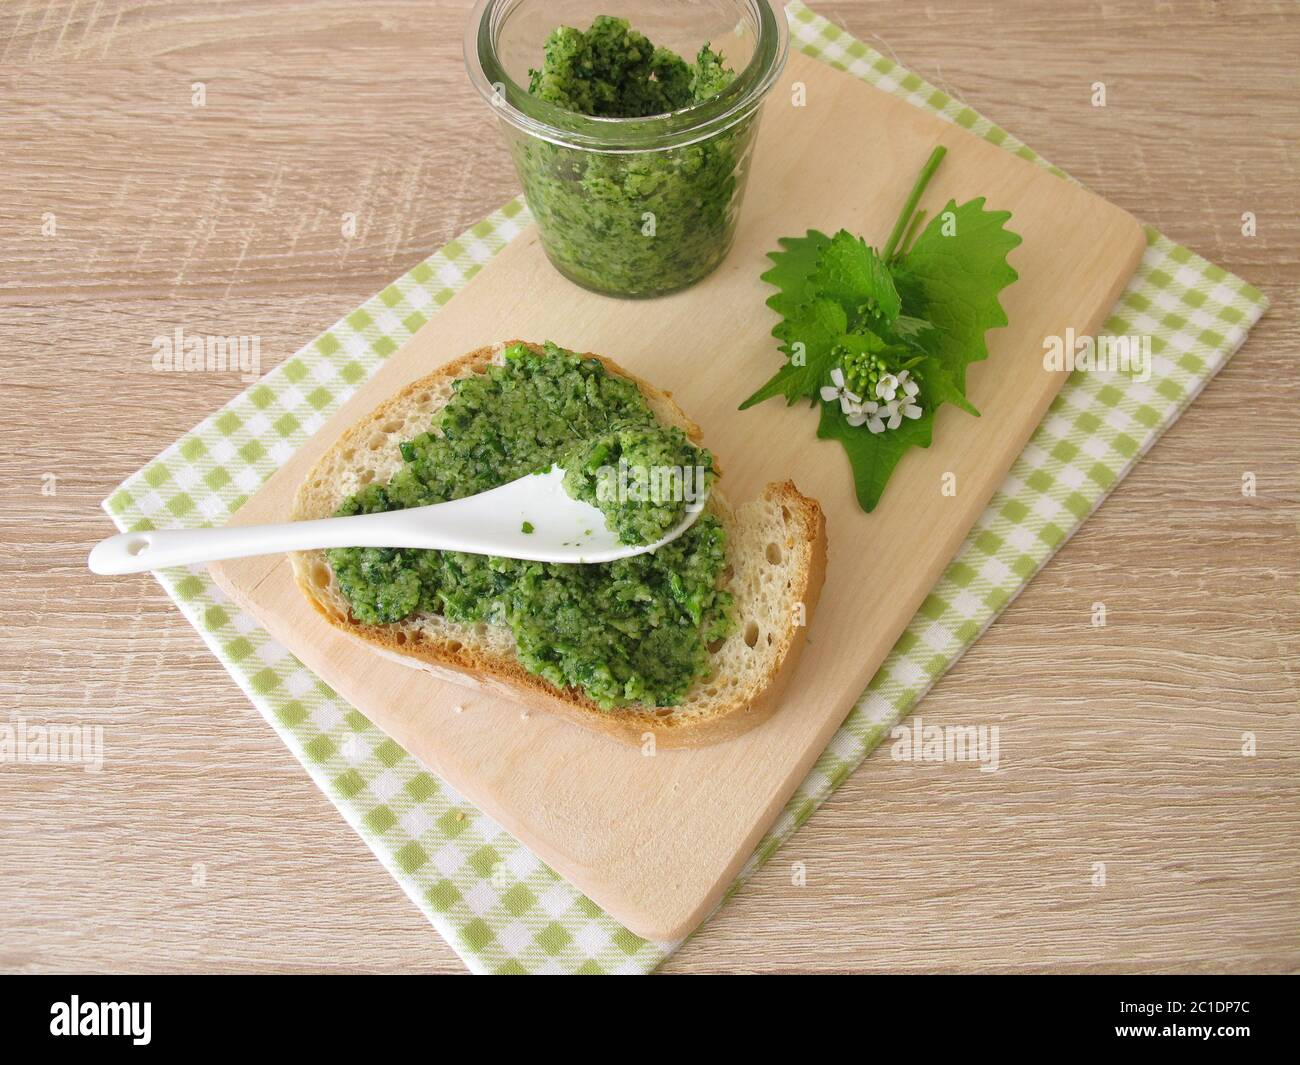 Homemade garlic mustard pesto on baguette Stock Photo